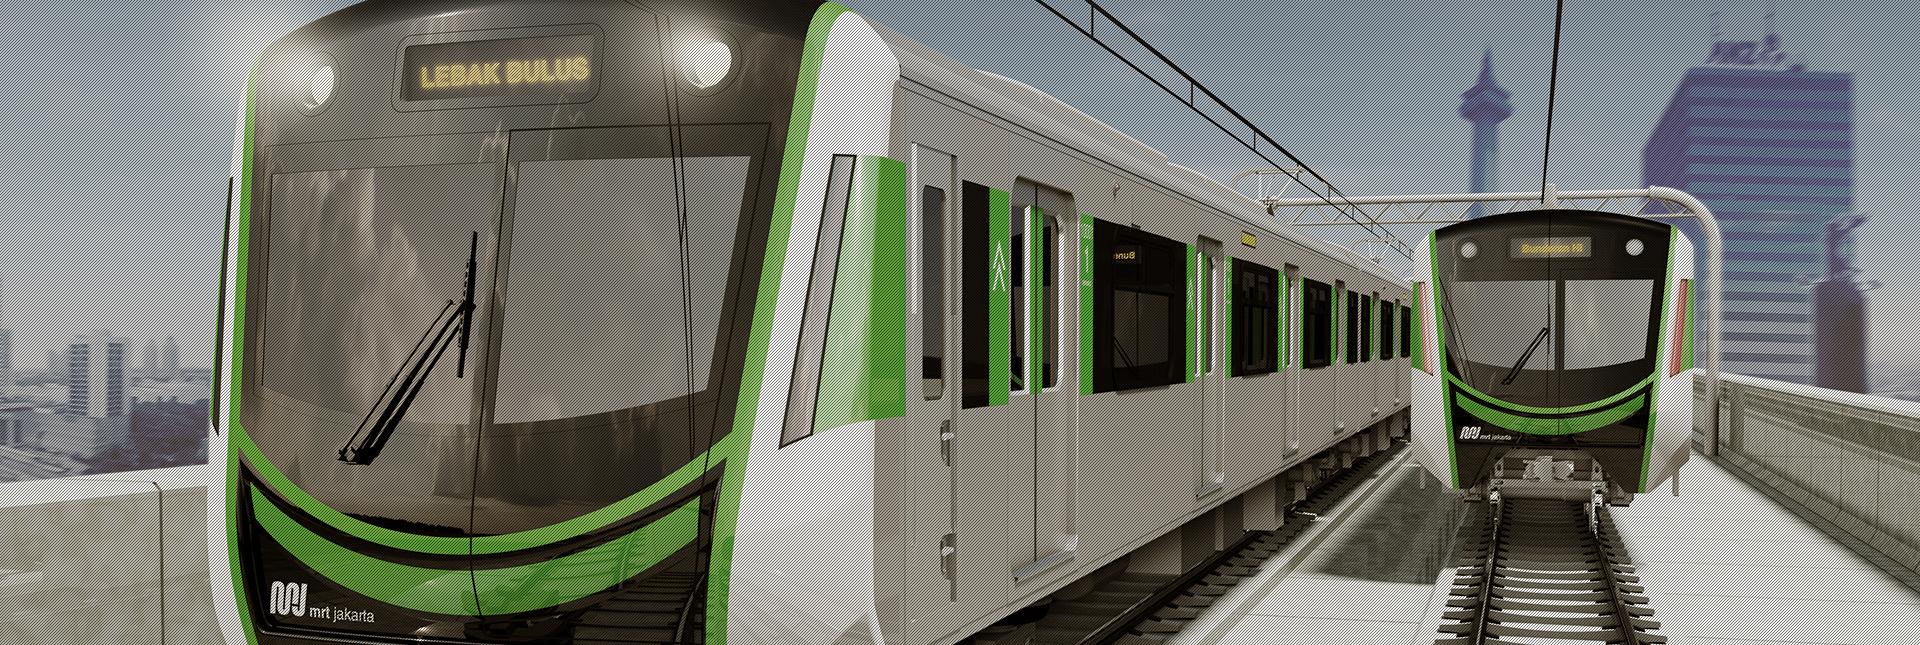 "MRT Jakarta: Ketika Aspek ""Desain"" Mulai Menjadi Perhatian Pemerintah"